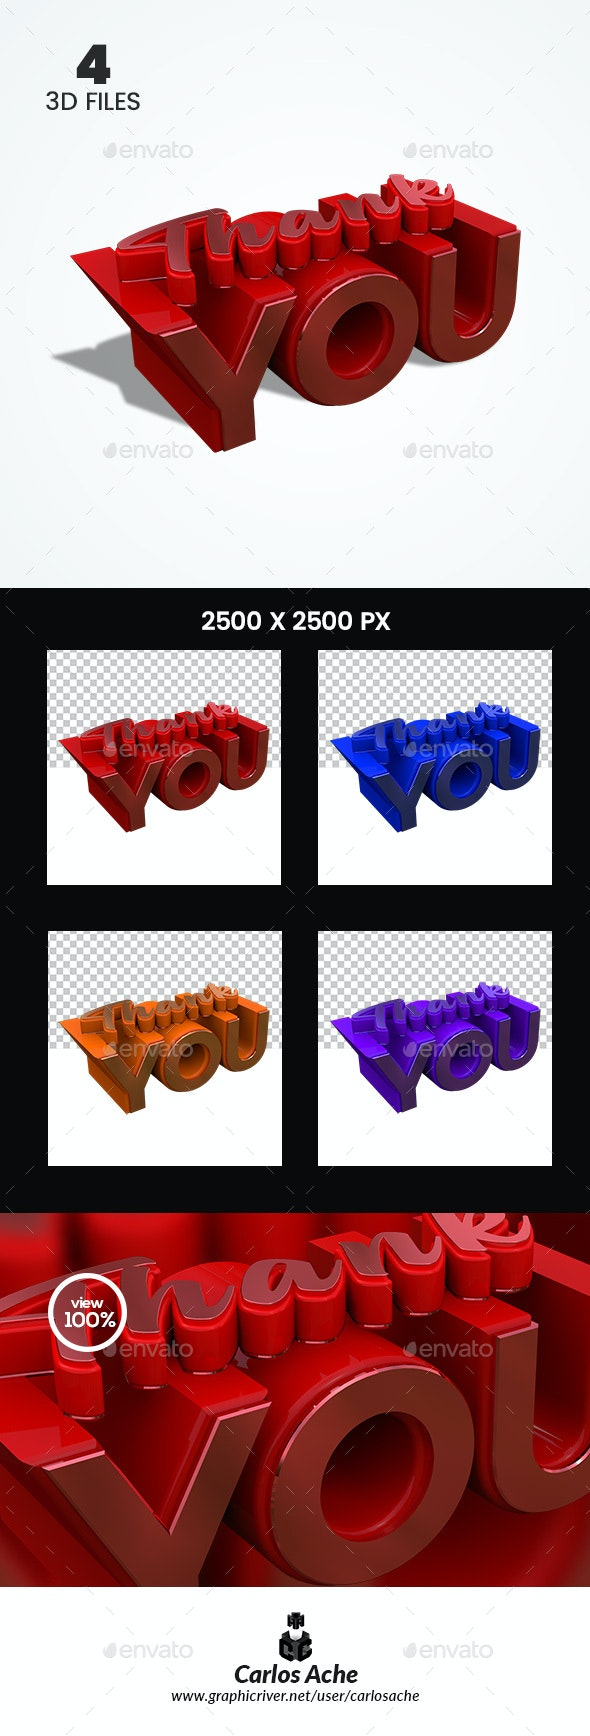 Thank You Colors 3D Render - Text 3D Renders